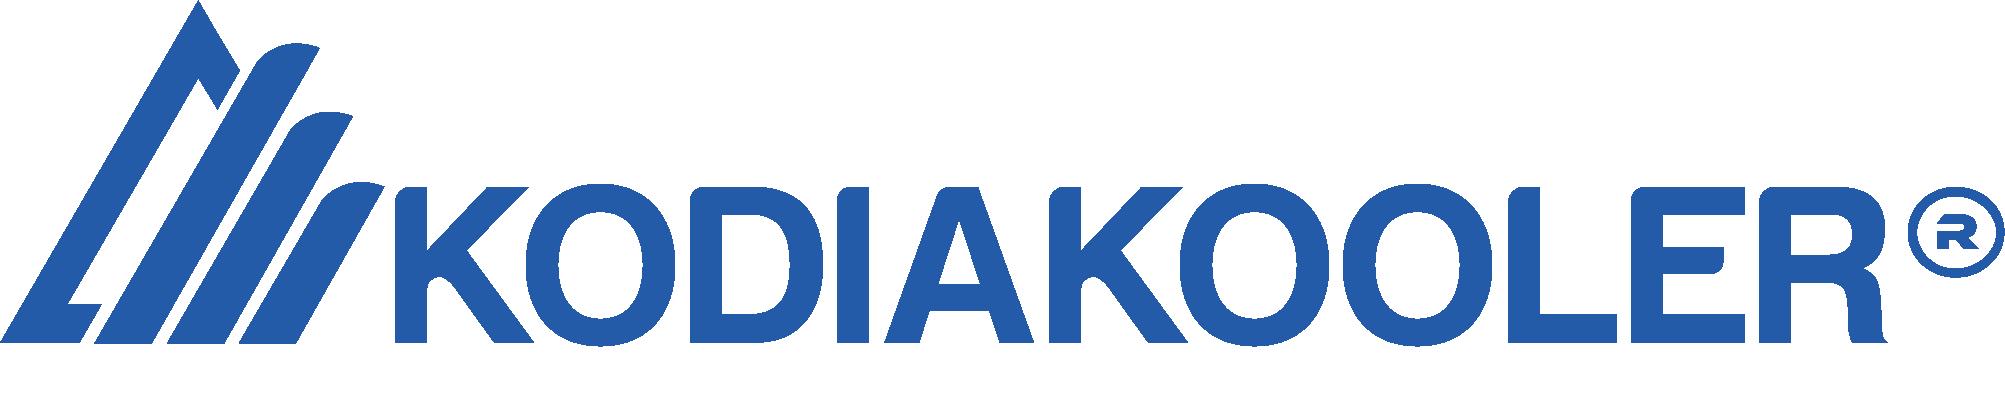 KODIAKOOLER Logo